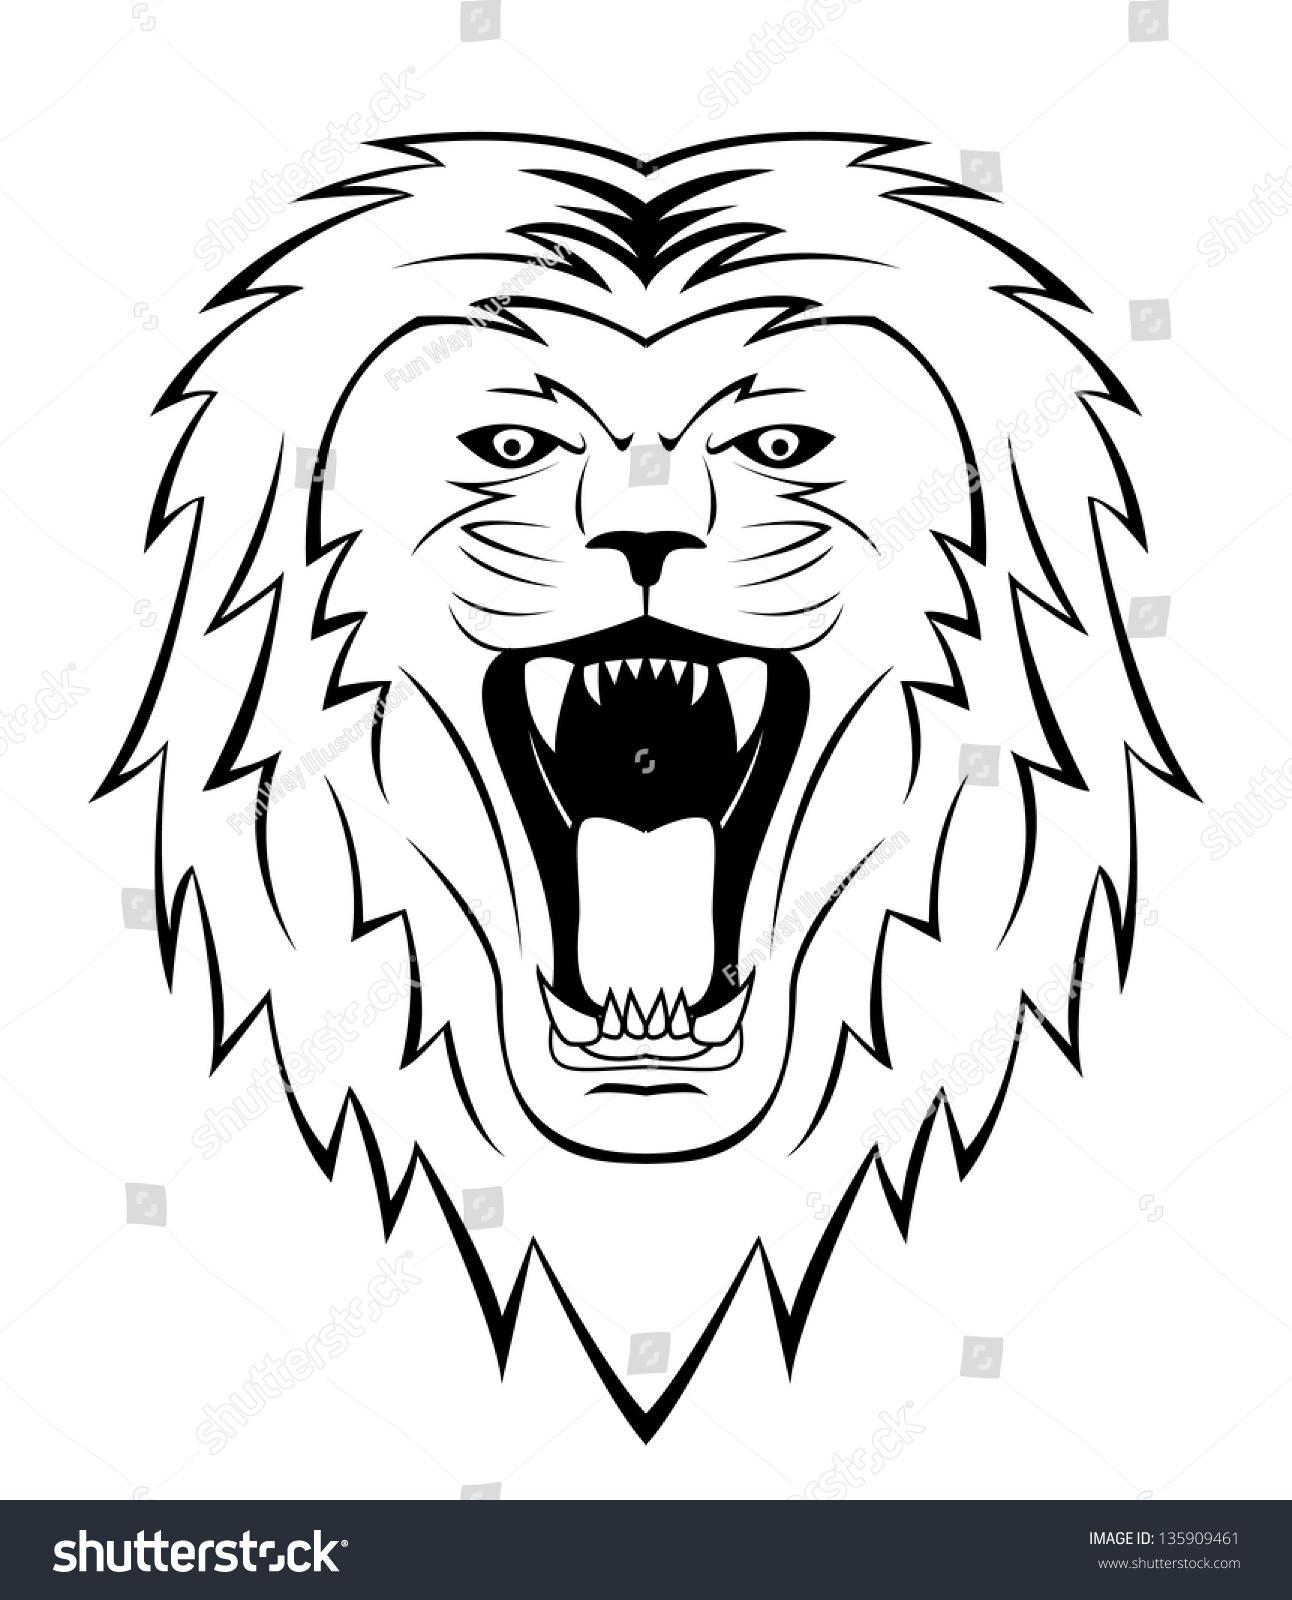 Royalty-free Lion roar #135909461 Stock Photo   Avopix.com - photo#43